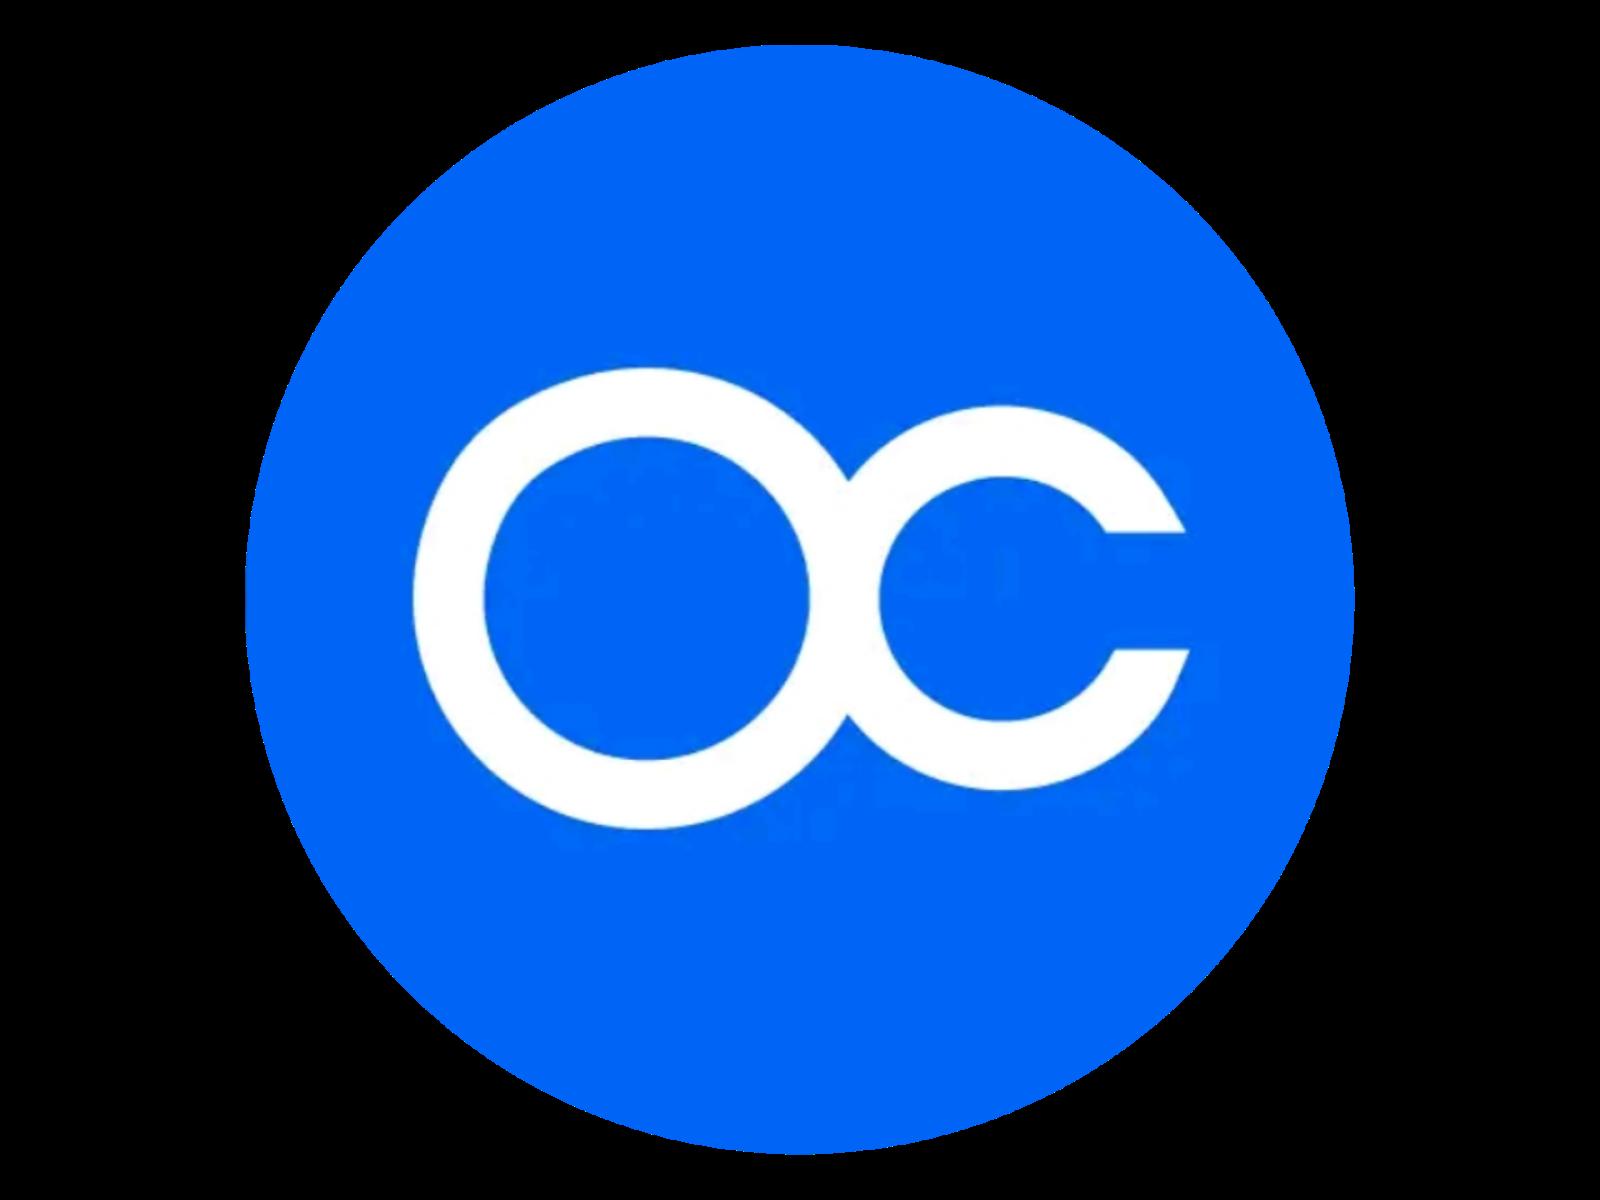 Logo OctaFX Trading